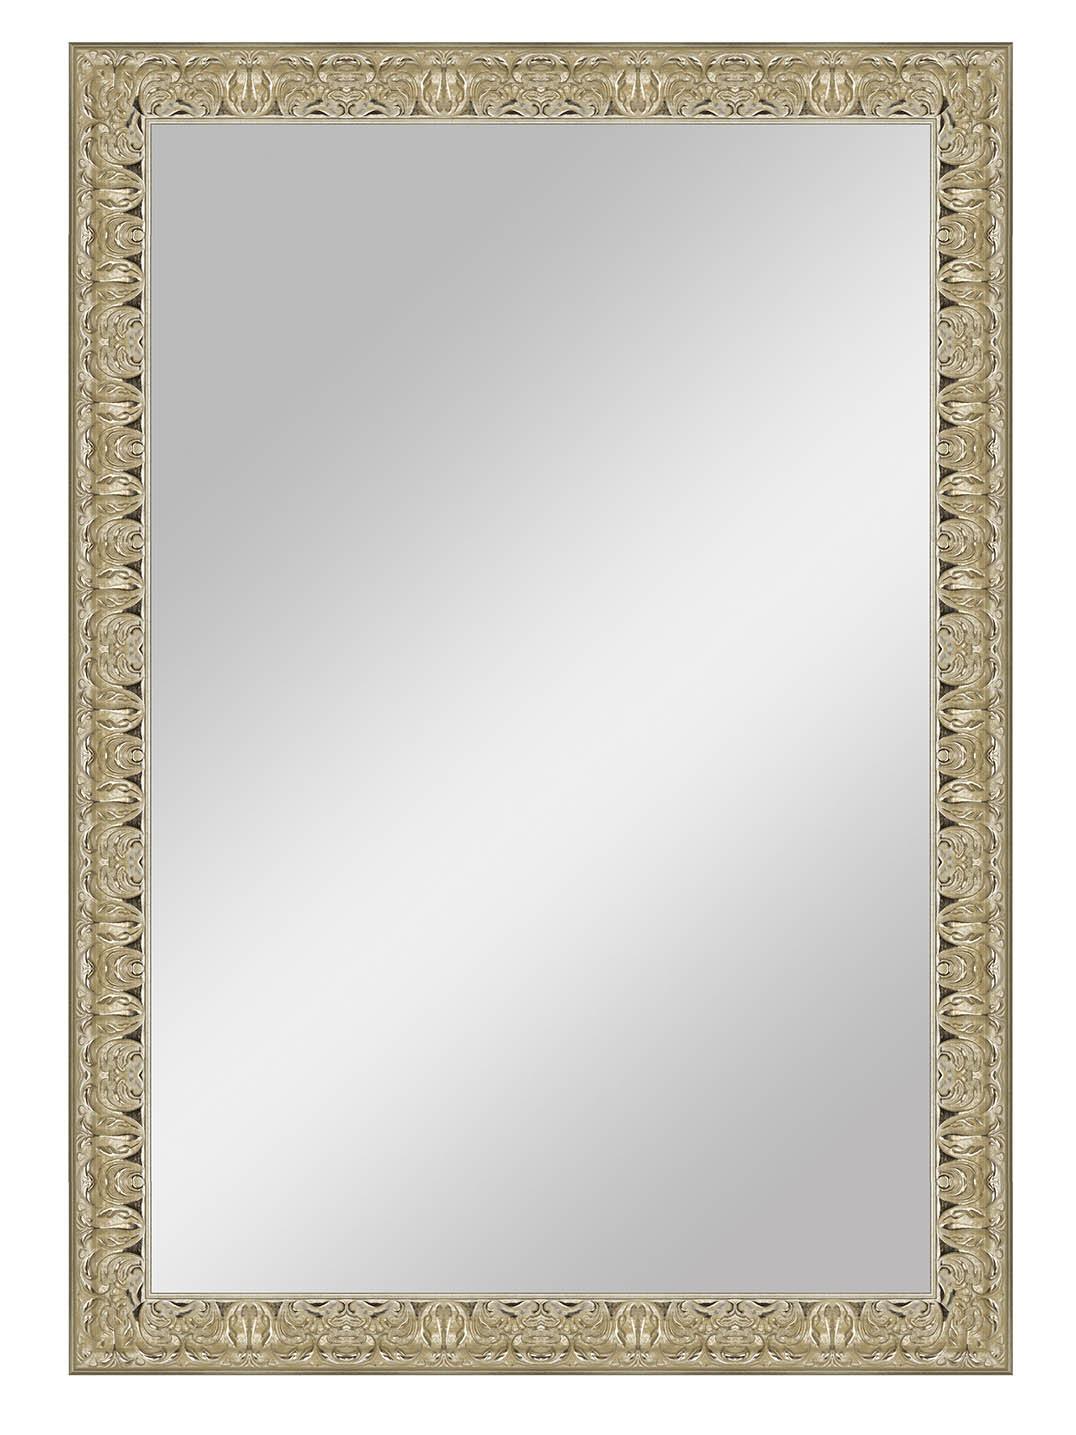 Купить Зеркало Аурелия , inmyroom, Россия